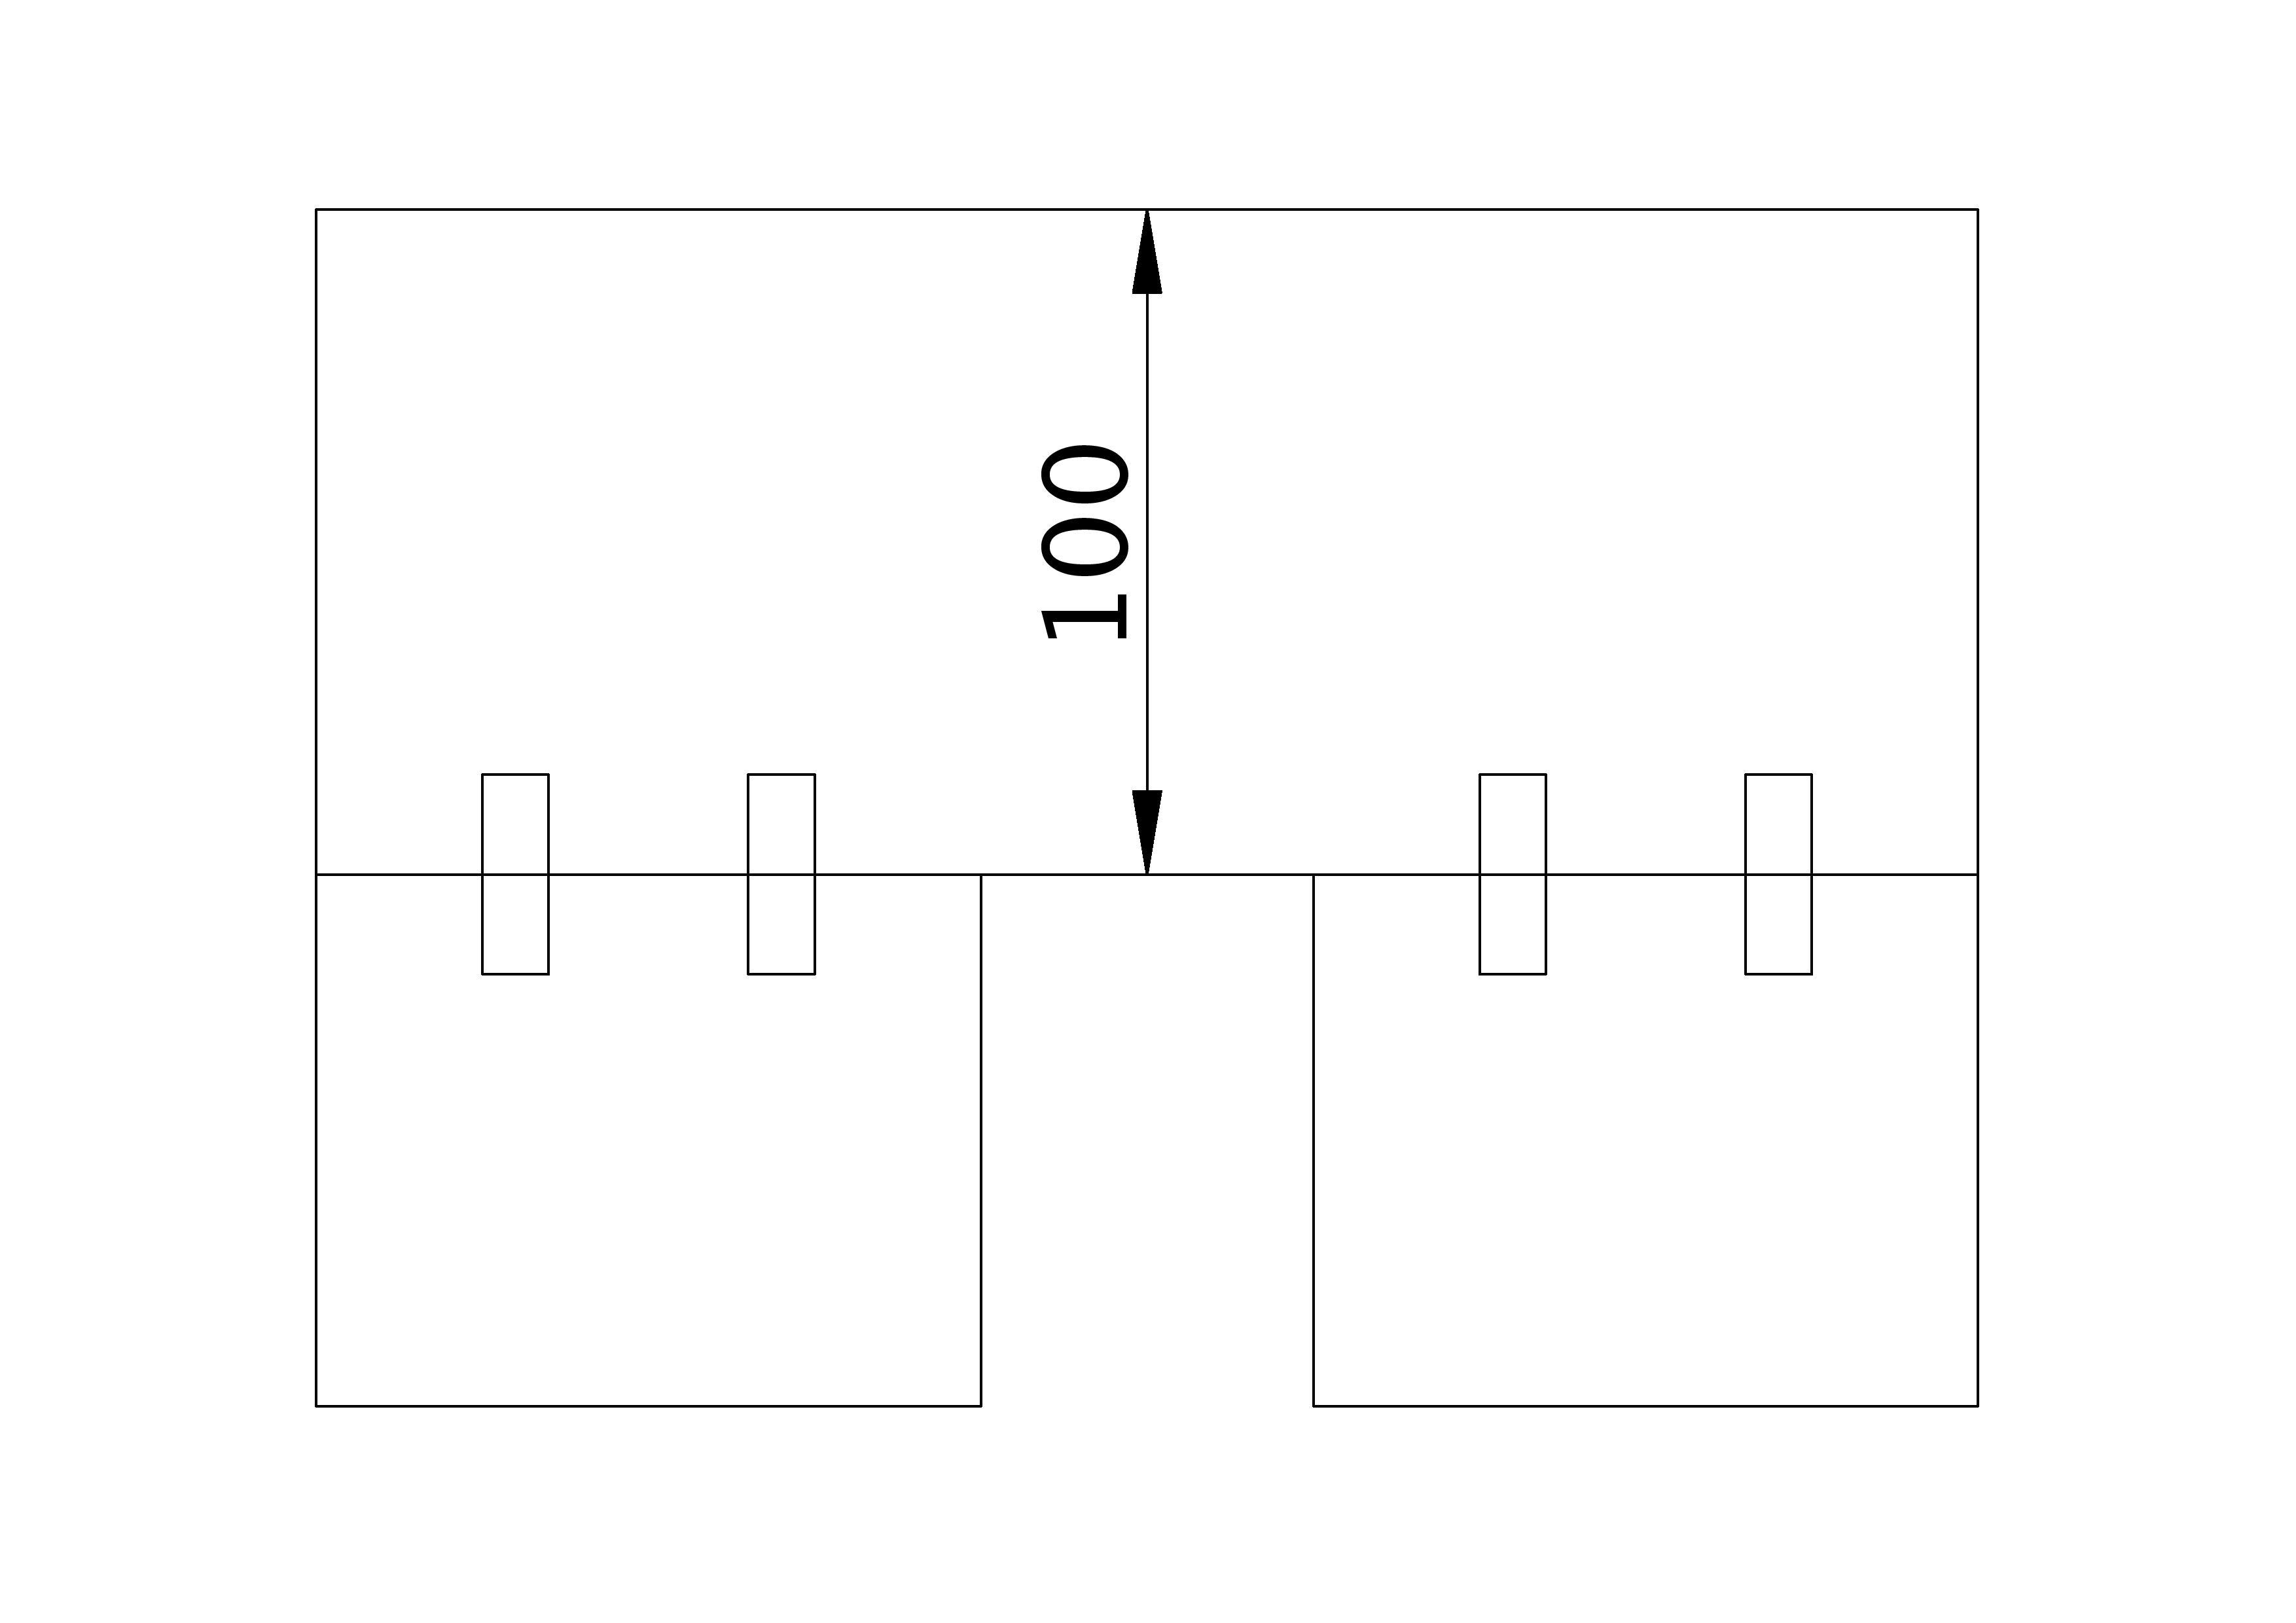 Rail and Feet-page-001-2.jpg